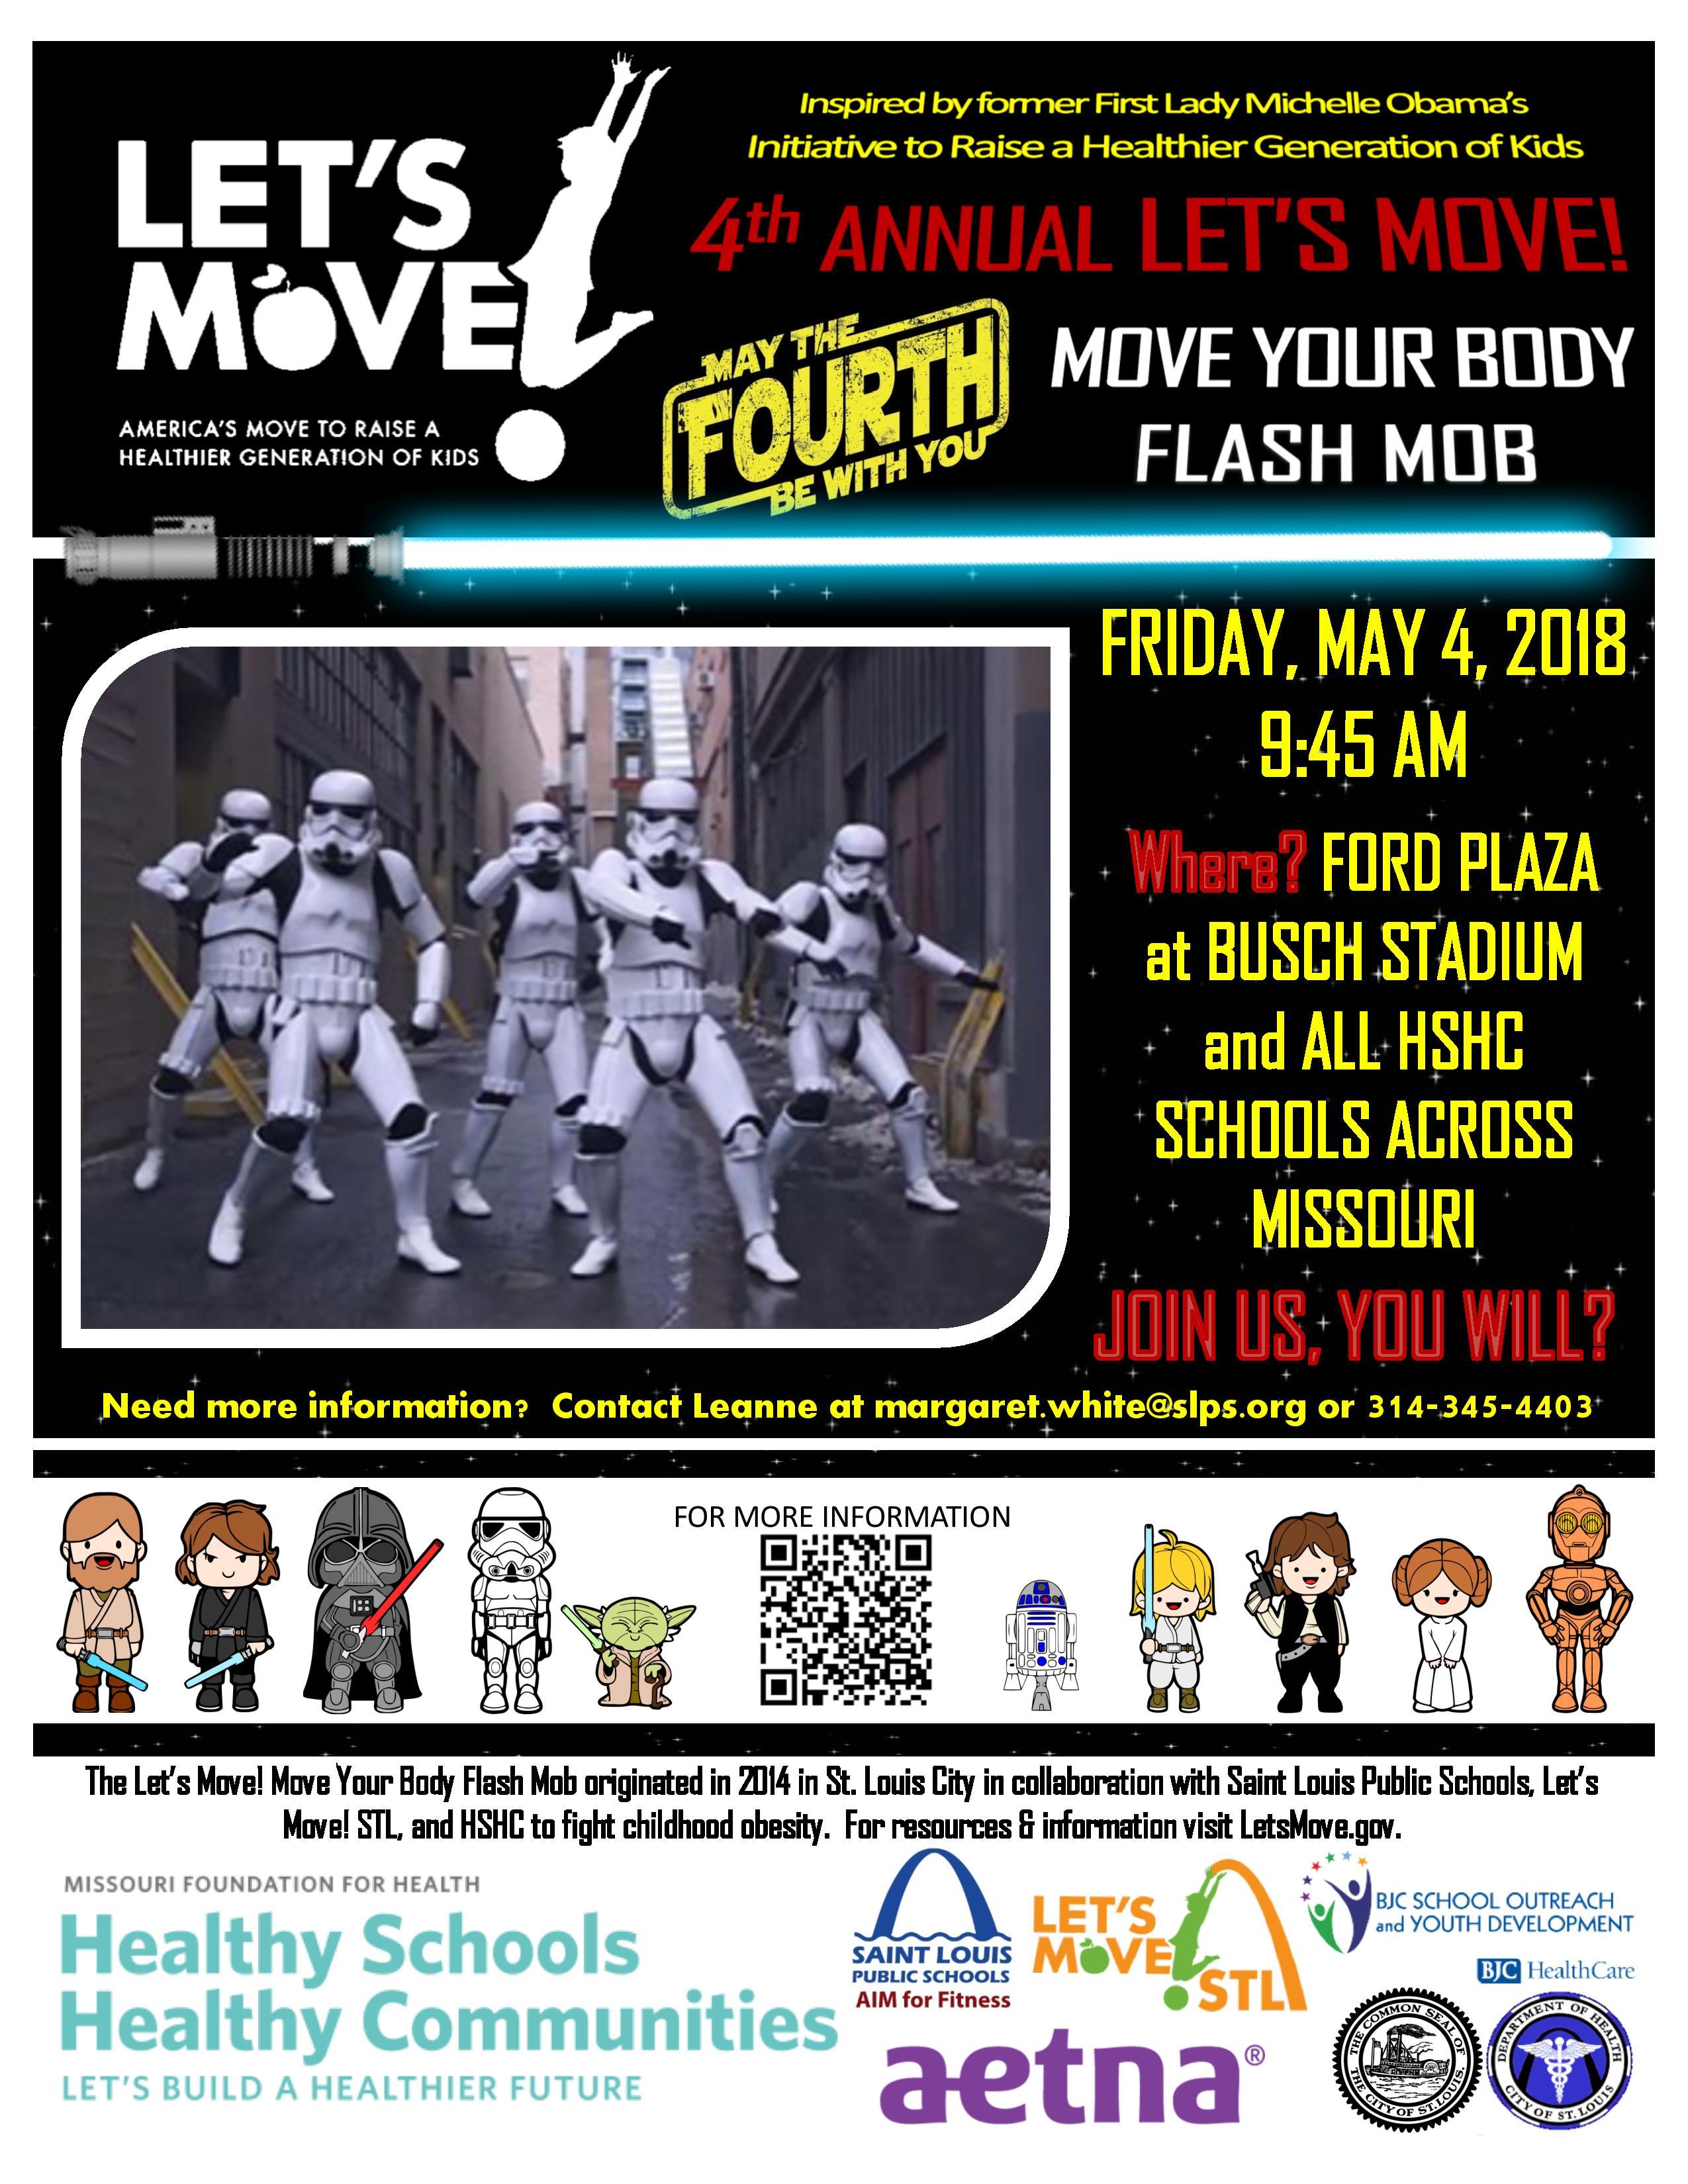 2018 Let's Move STL Flash Mob - May 4, 2018